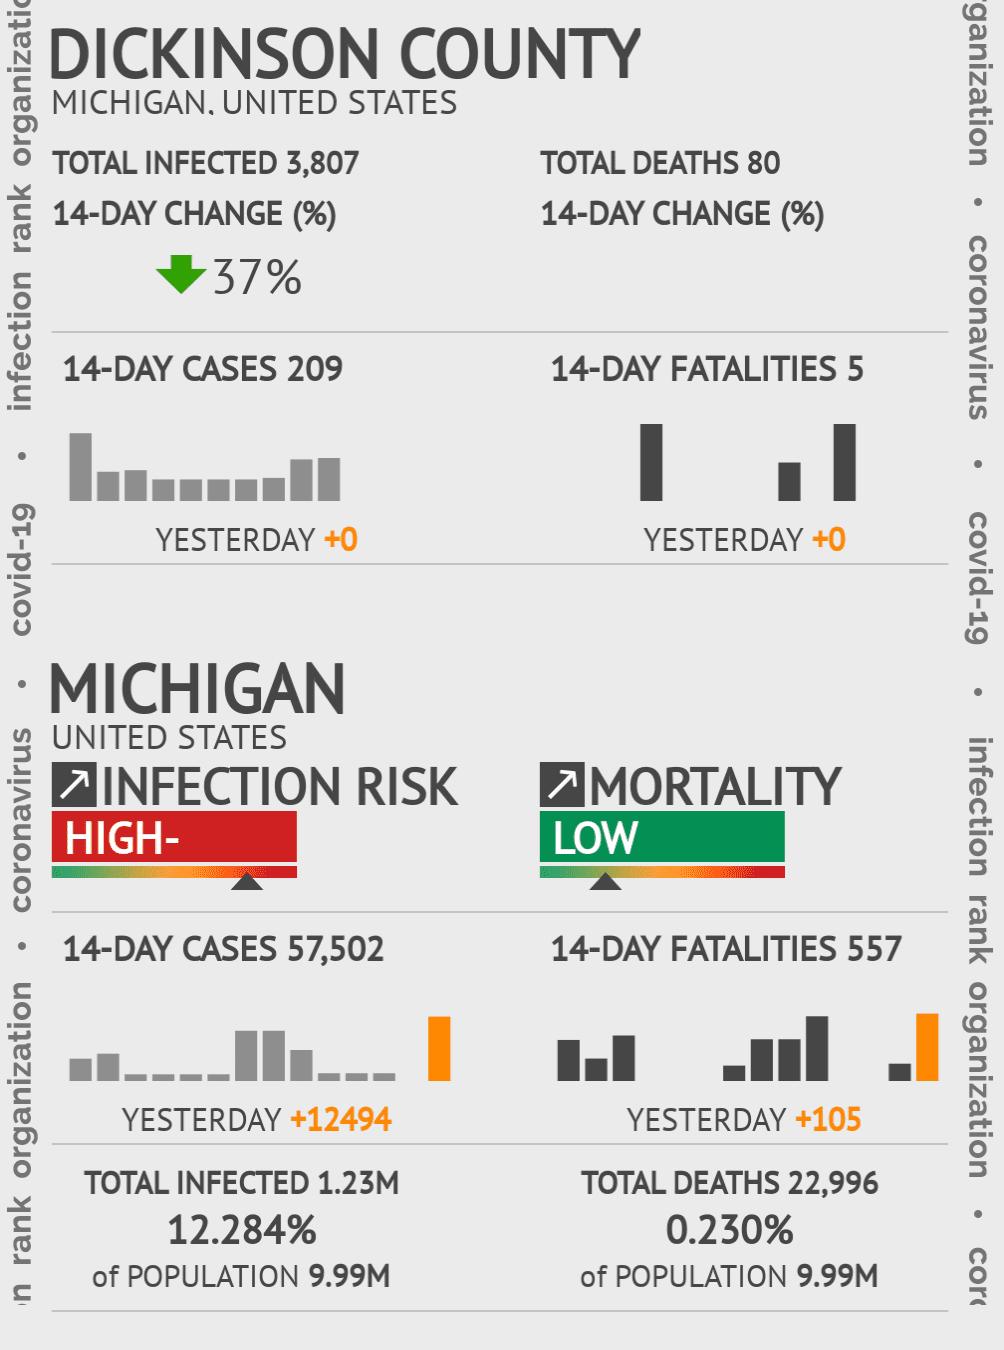 Dickinson County Coronavirus Covid-19 Risk of Infection on February 24, 2021